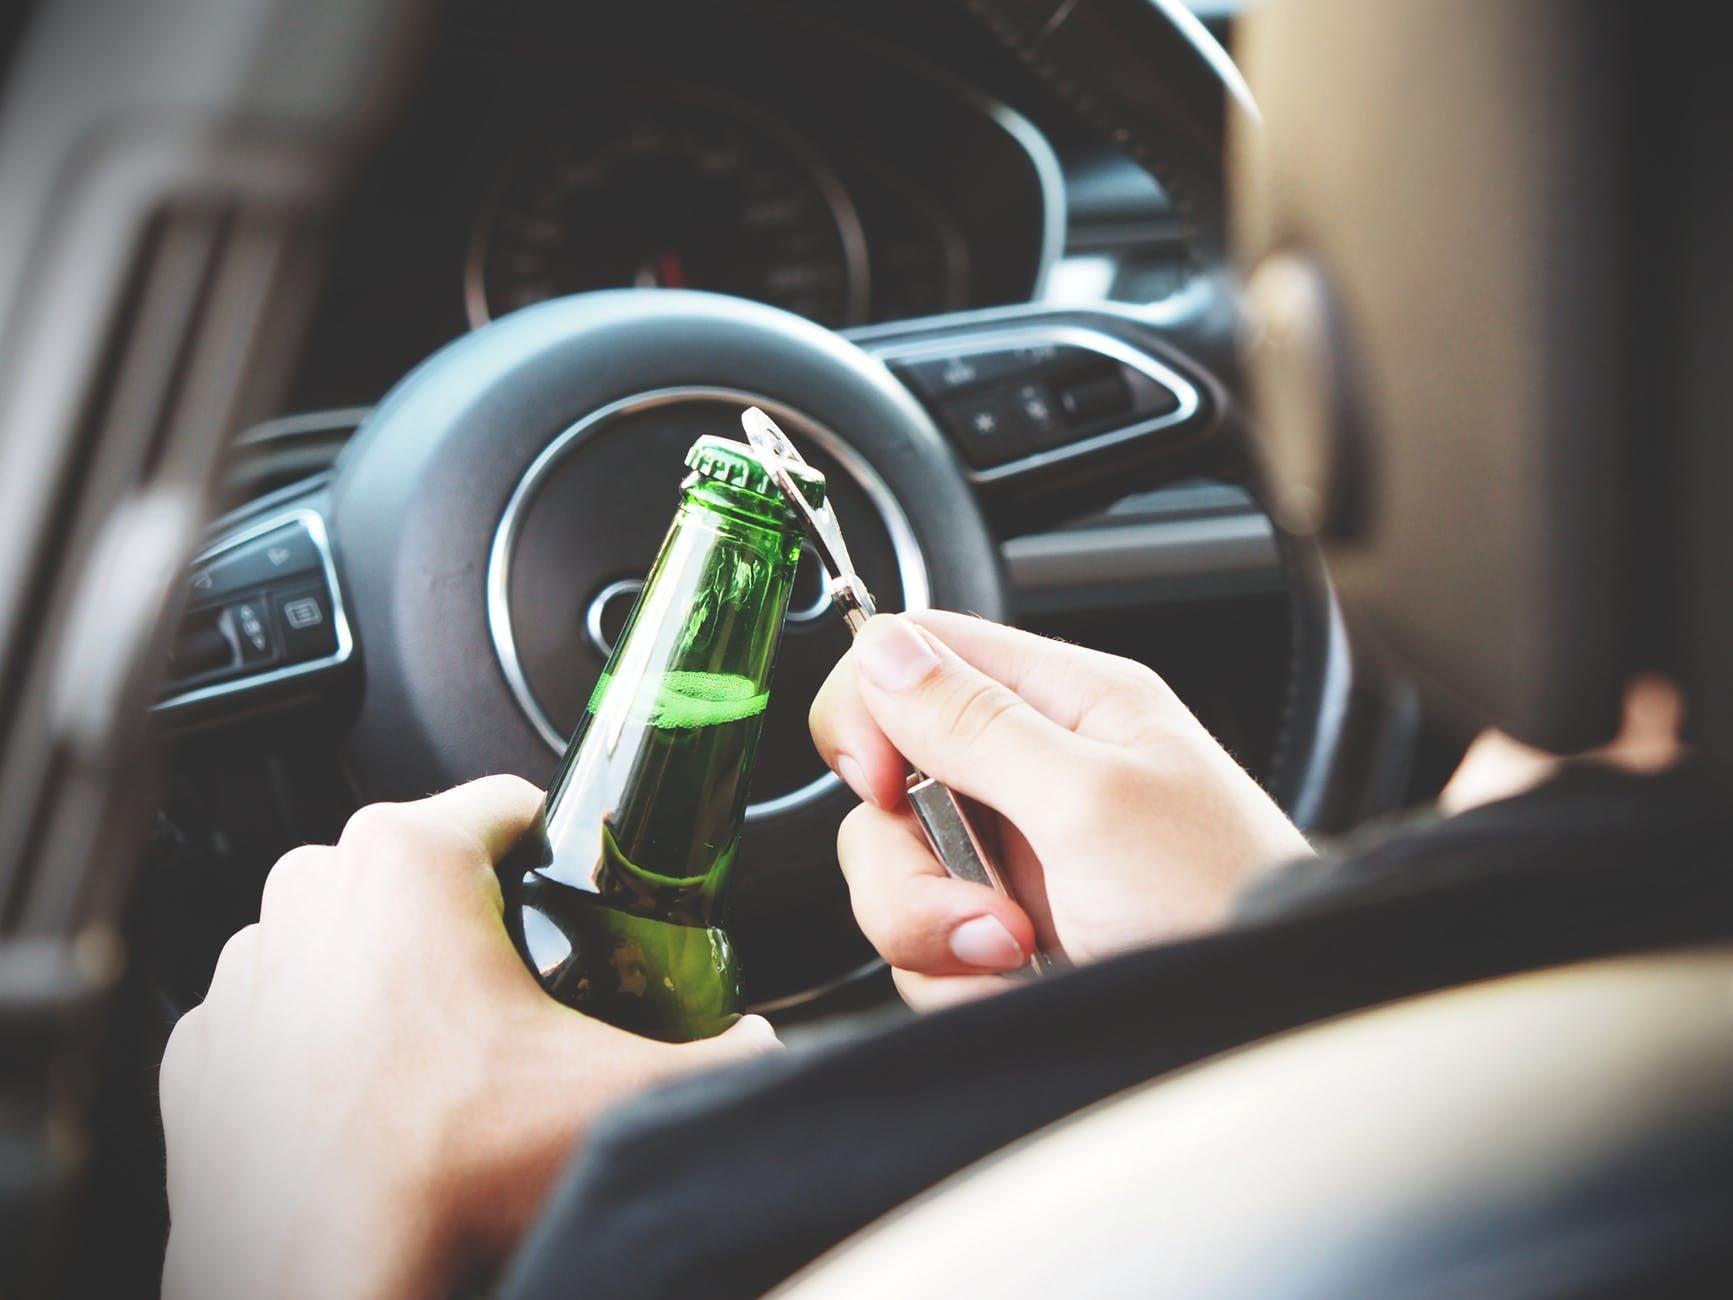 Bafômetro: As consequências de beber e dirigir